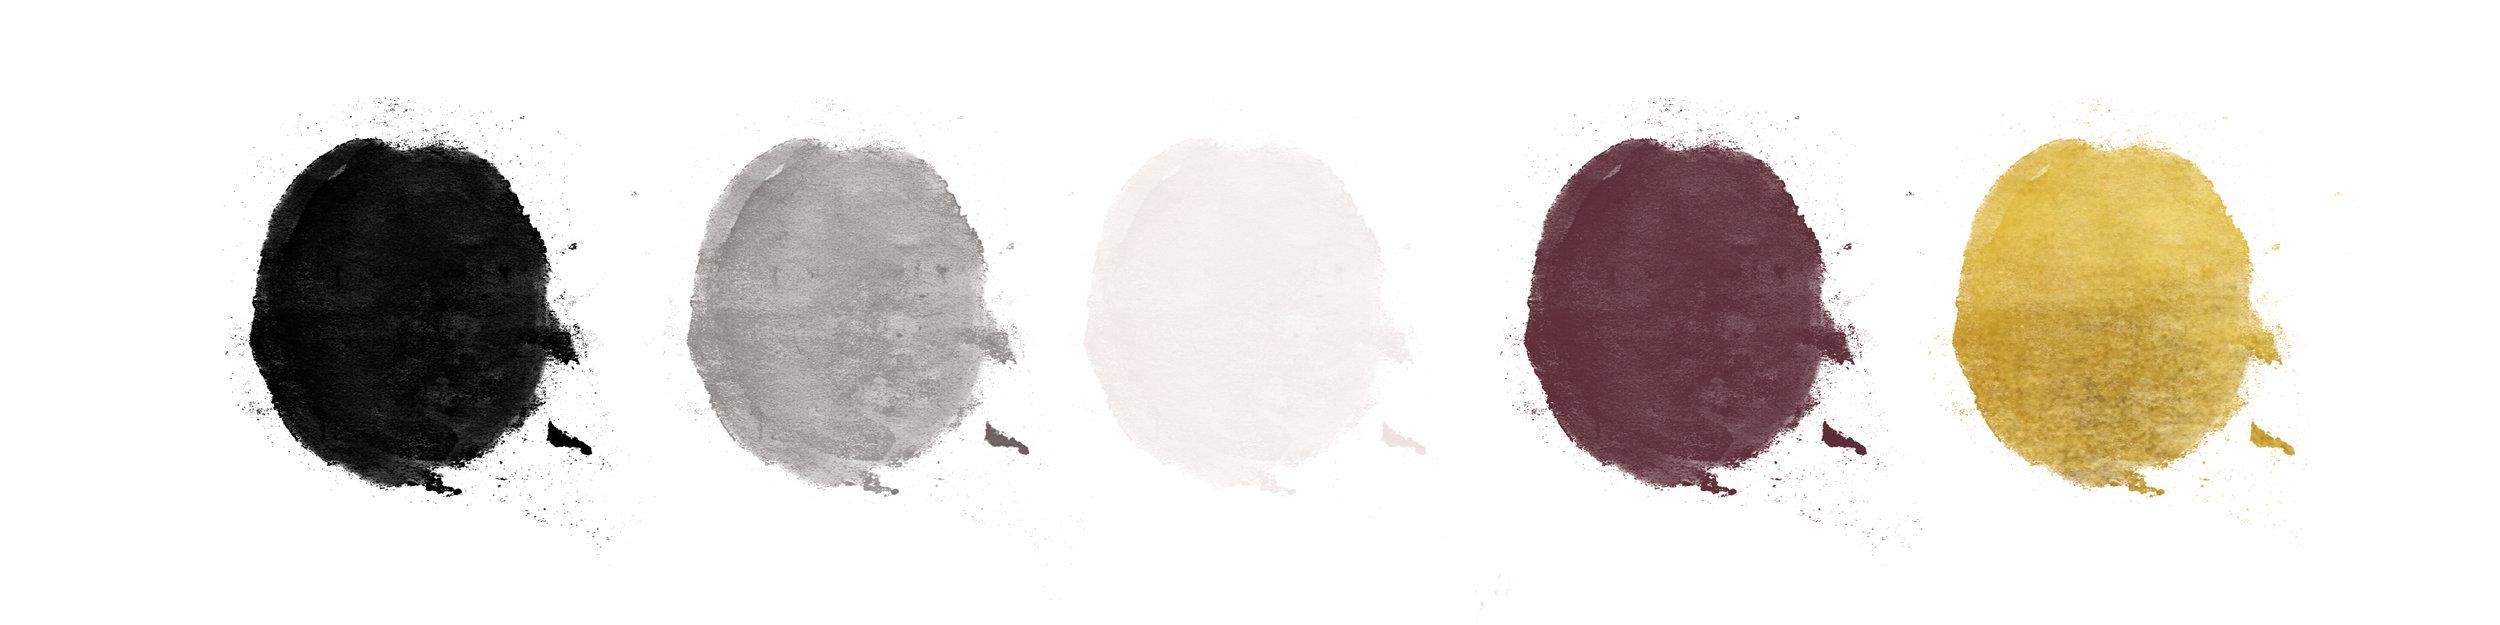 palettemegan.jpg